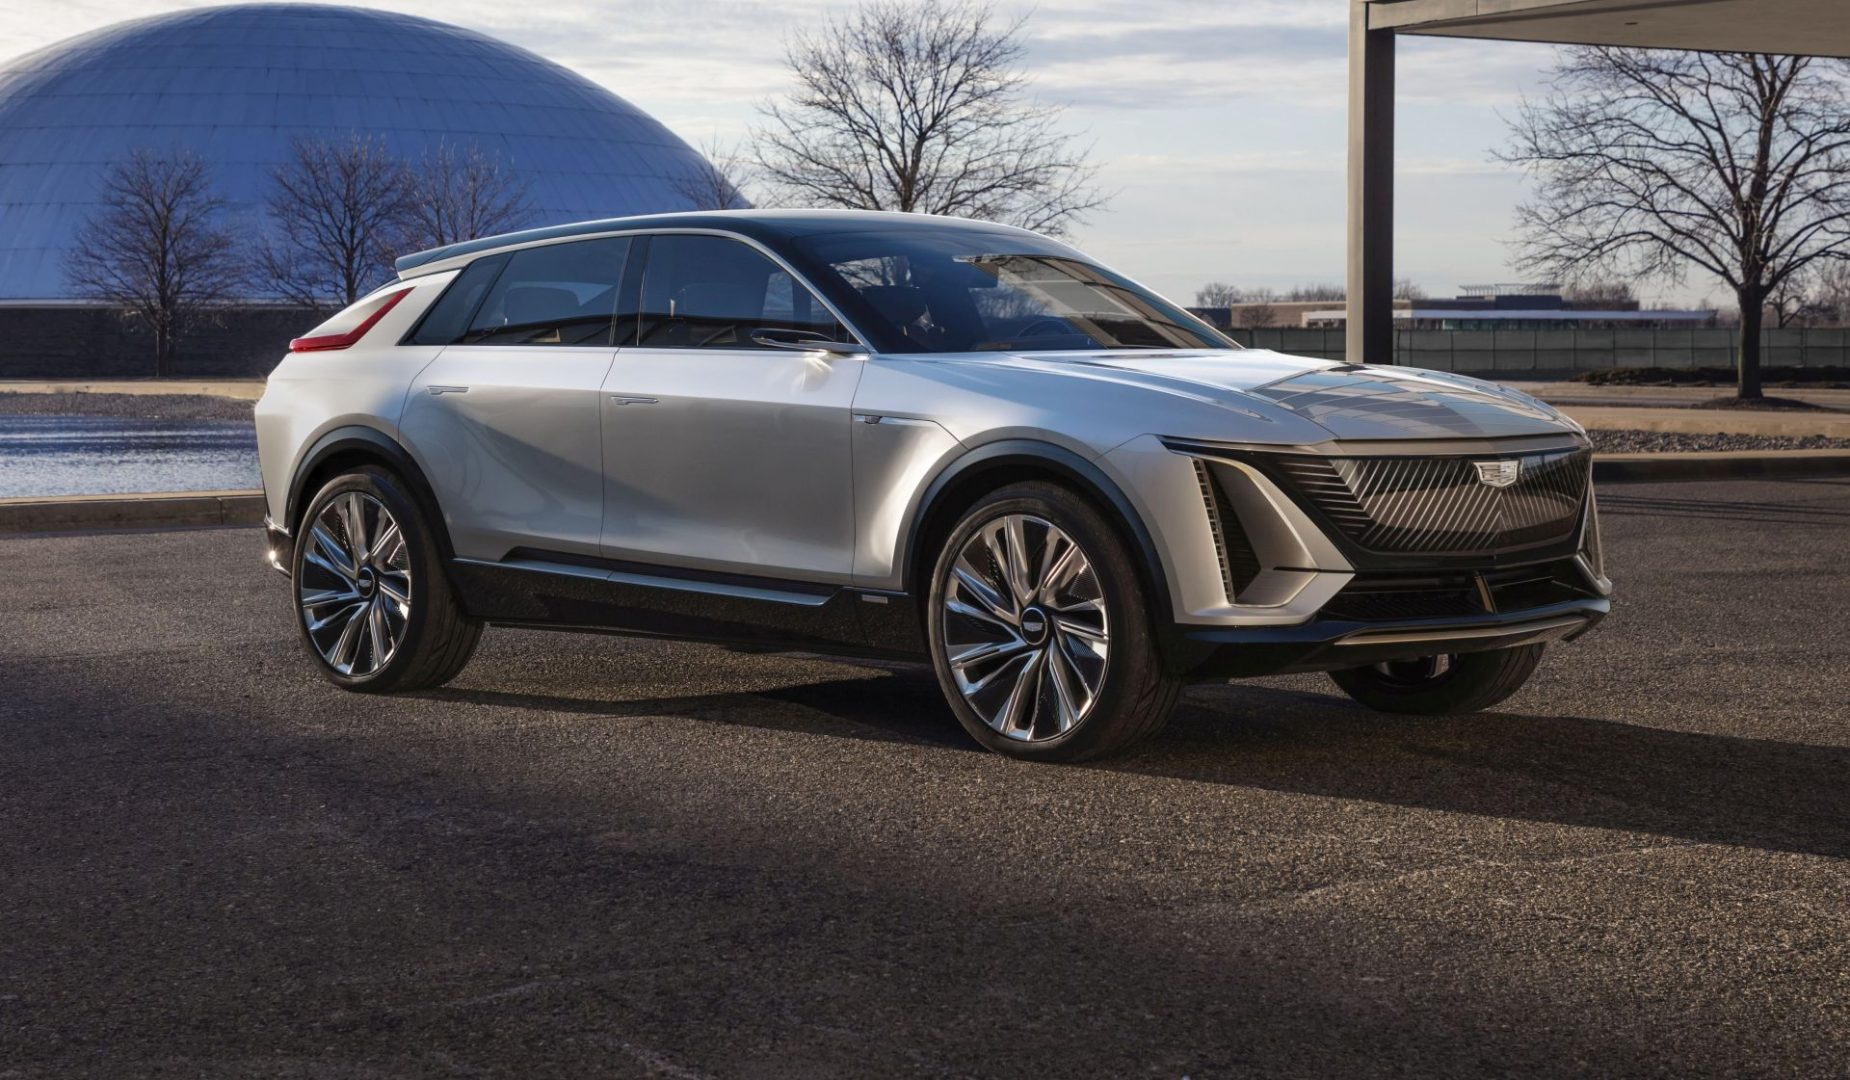 Cadillac Lyriq najavljuje budući izgled Cadillac automobila